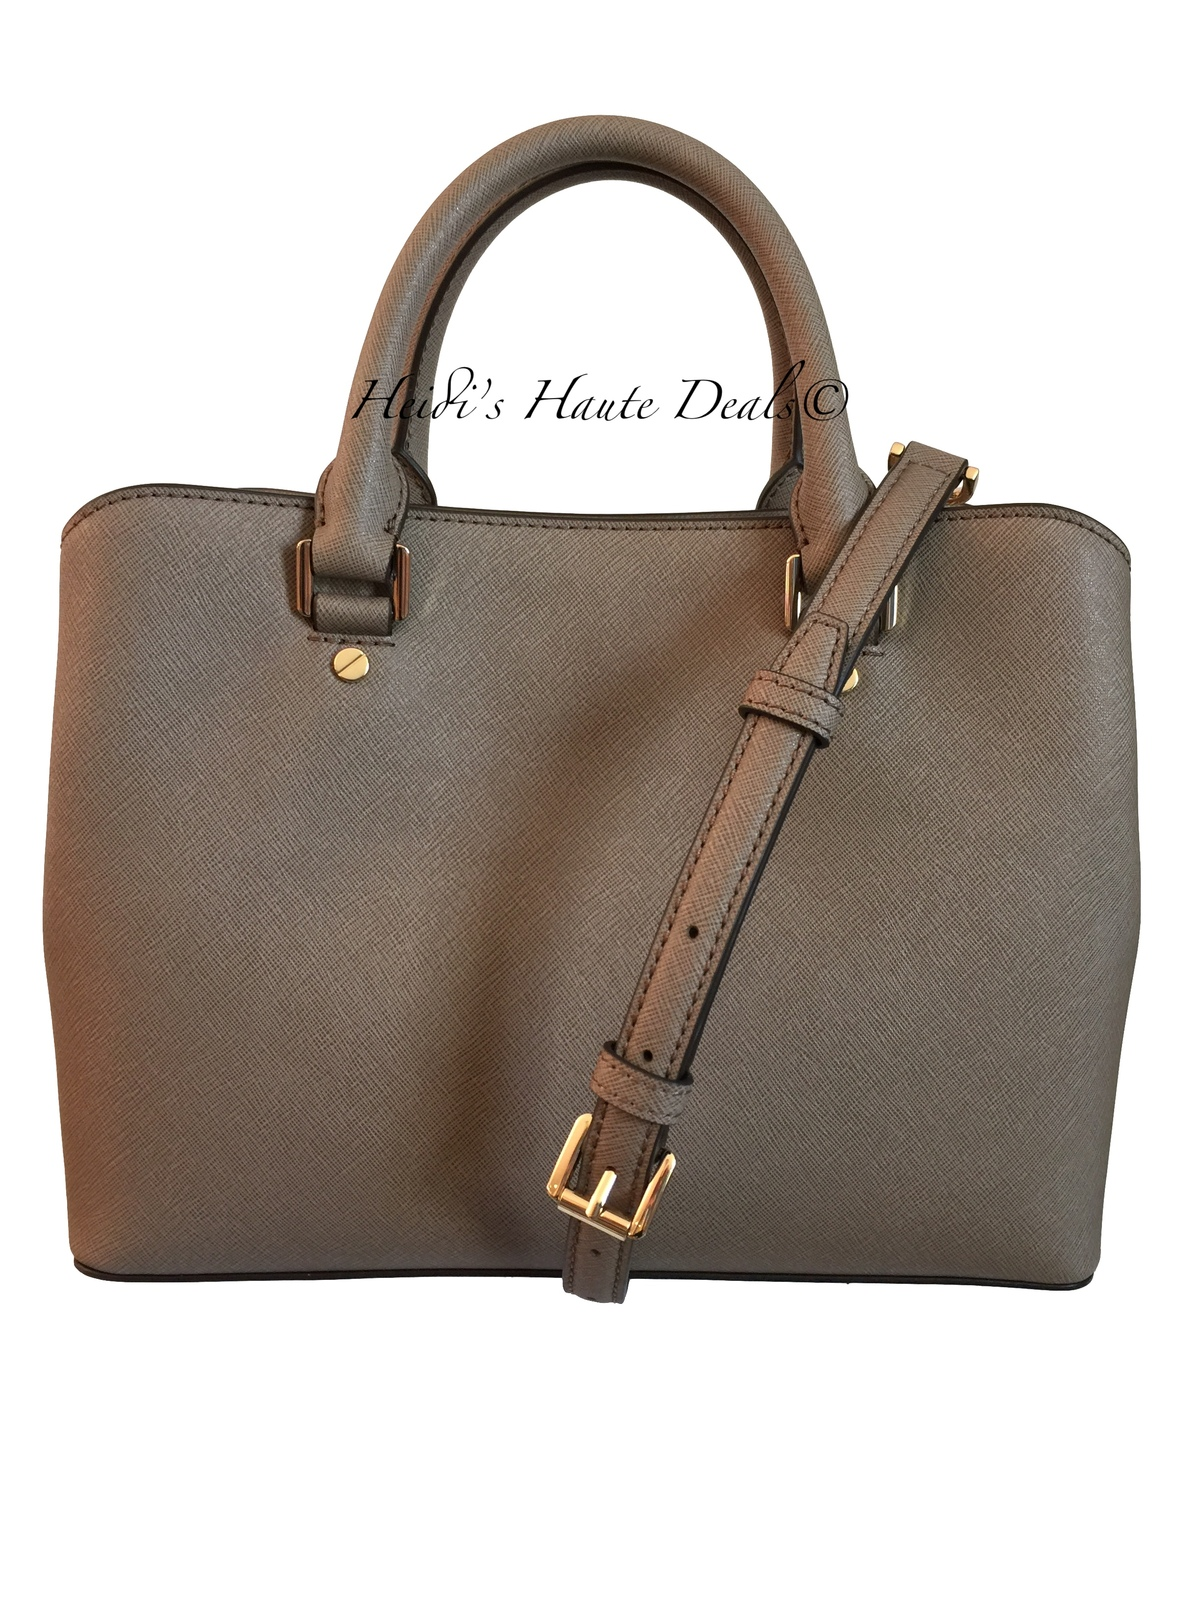 8c71371a3466 NWT MICHAEL KORS Savannah Medium Satchel Dark Dune Saffiano Leather Bag  Purse